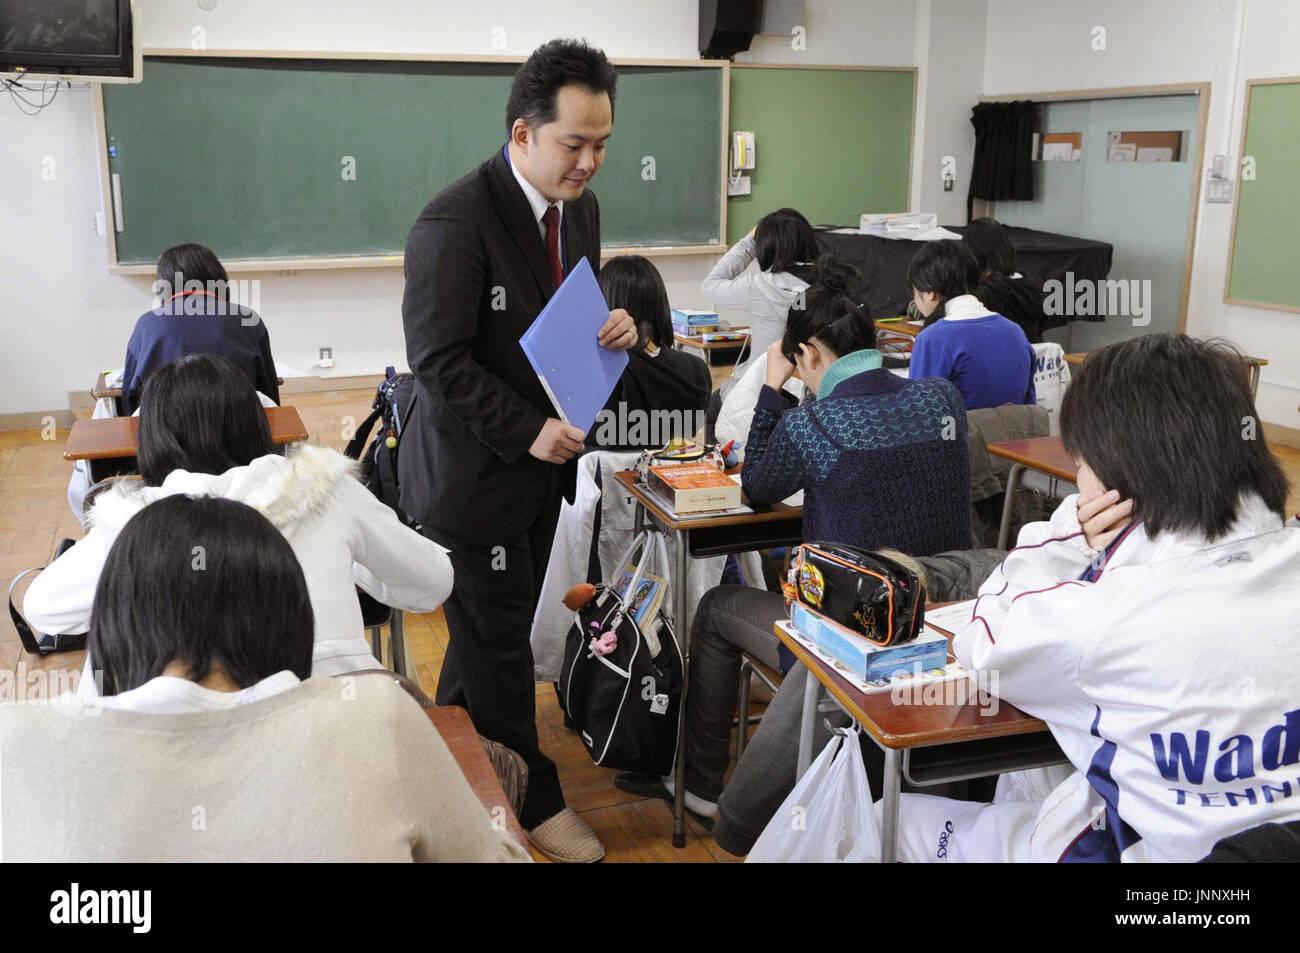 TOKYO, Japan - Eleven second-grade students at Wada Junior